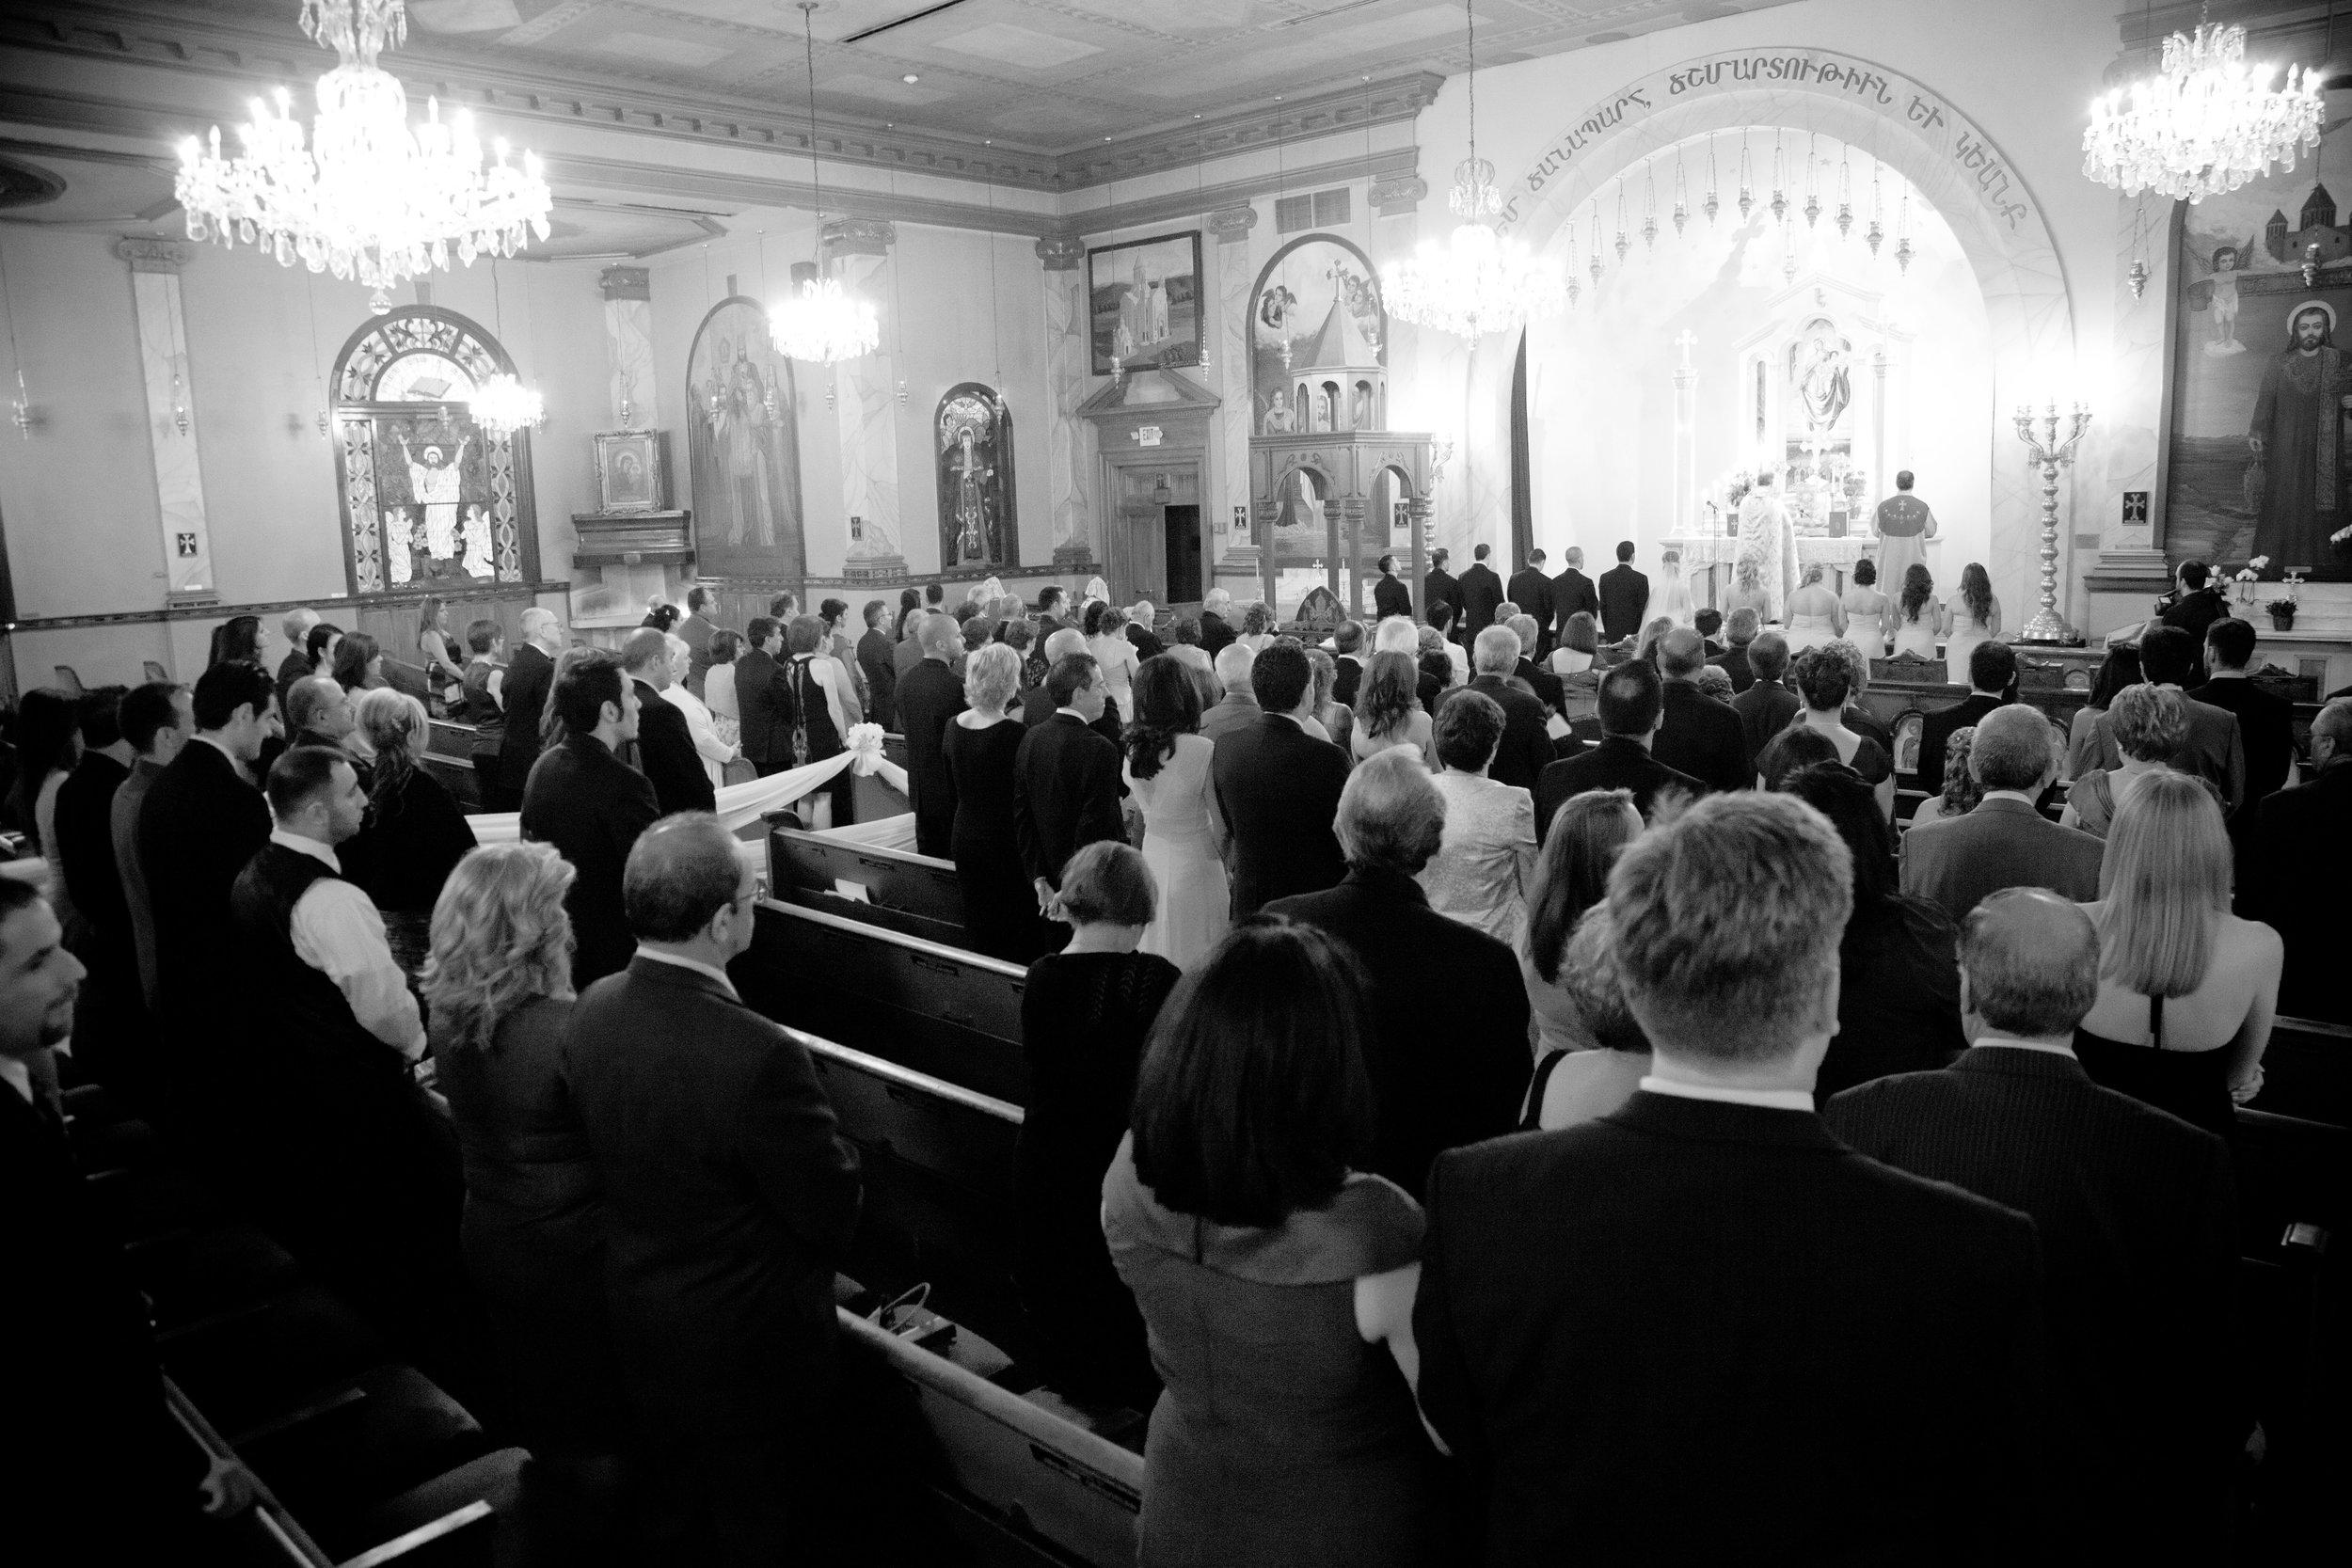 Catholic Church congregation during wedding ceremony